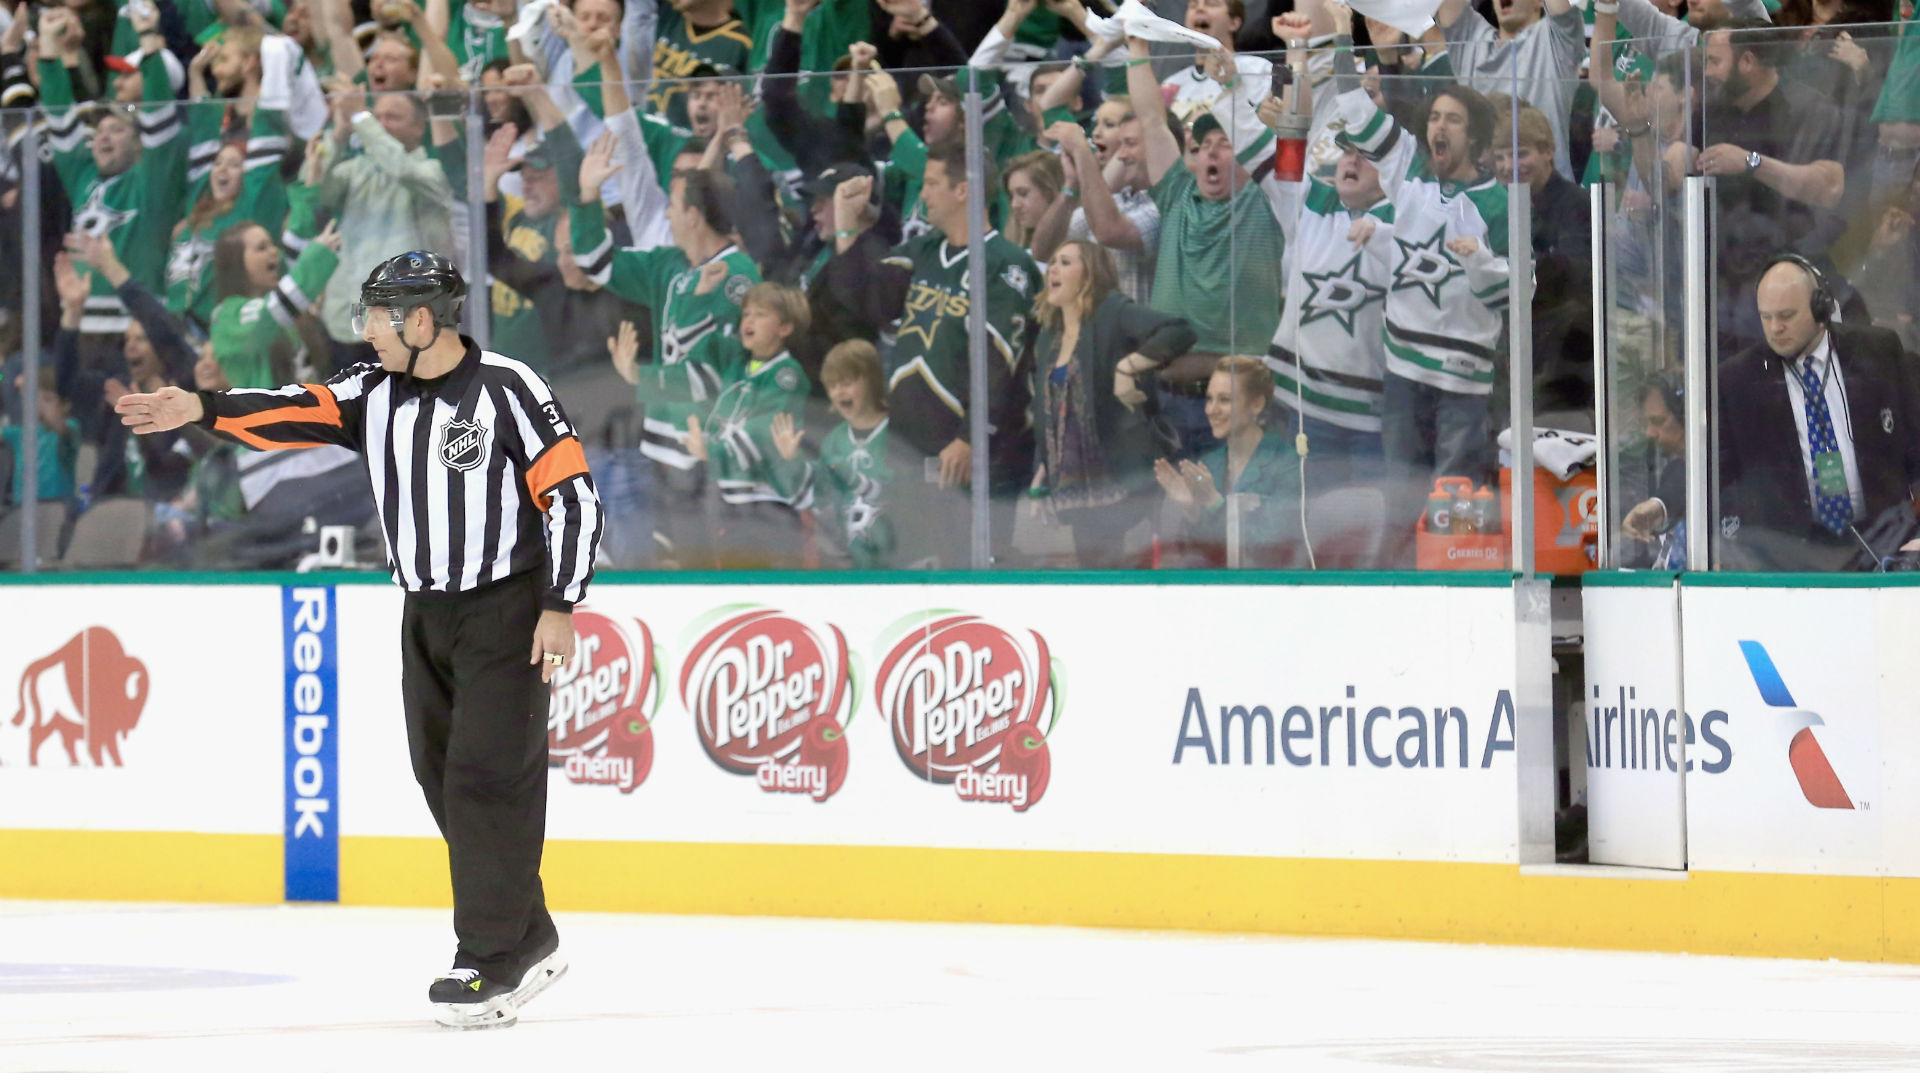 Nhl-officials-referees-ftr-getty-42216jpg_oeswsi630m9r1qw61m1496t2v